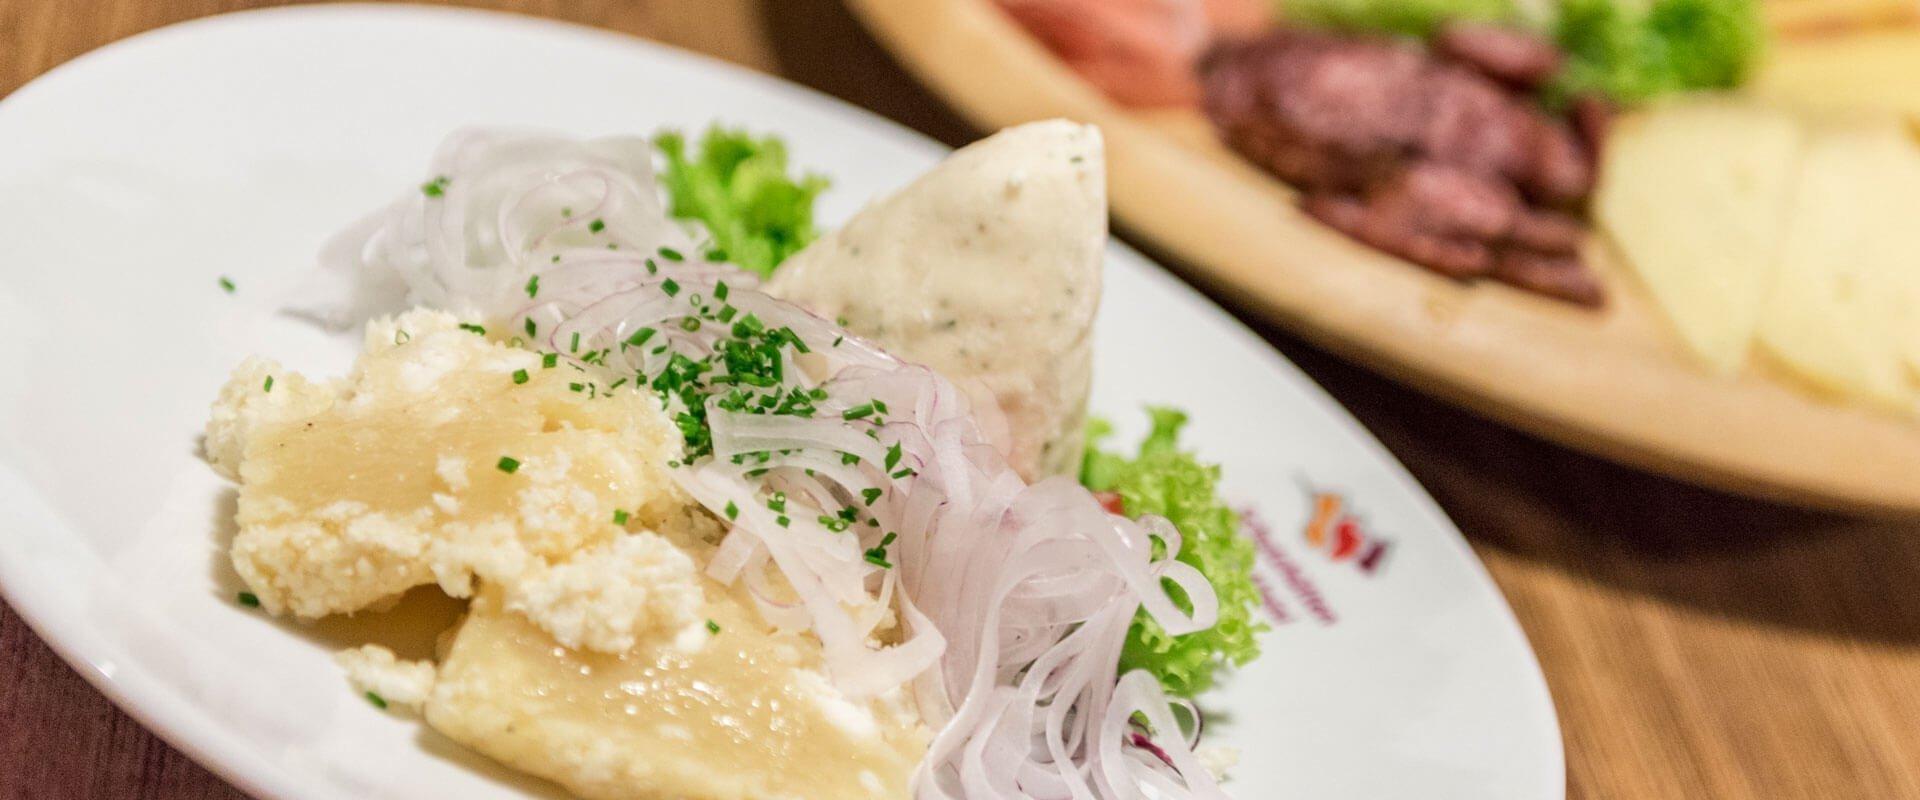 kulinarik-kreuzwiesenalm-luesen-suedtirol